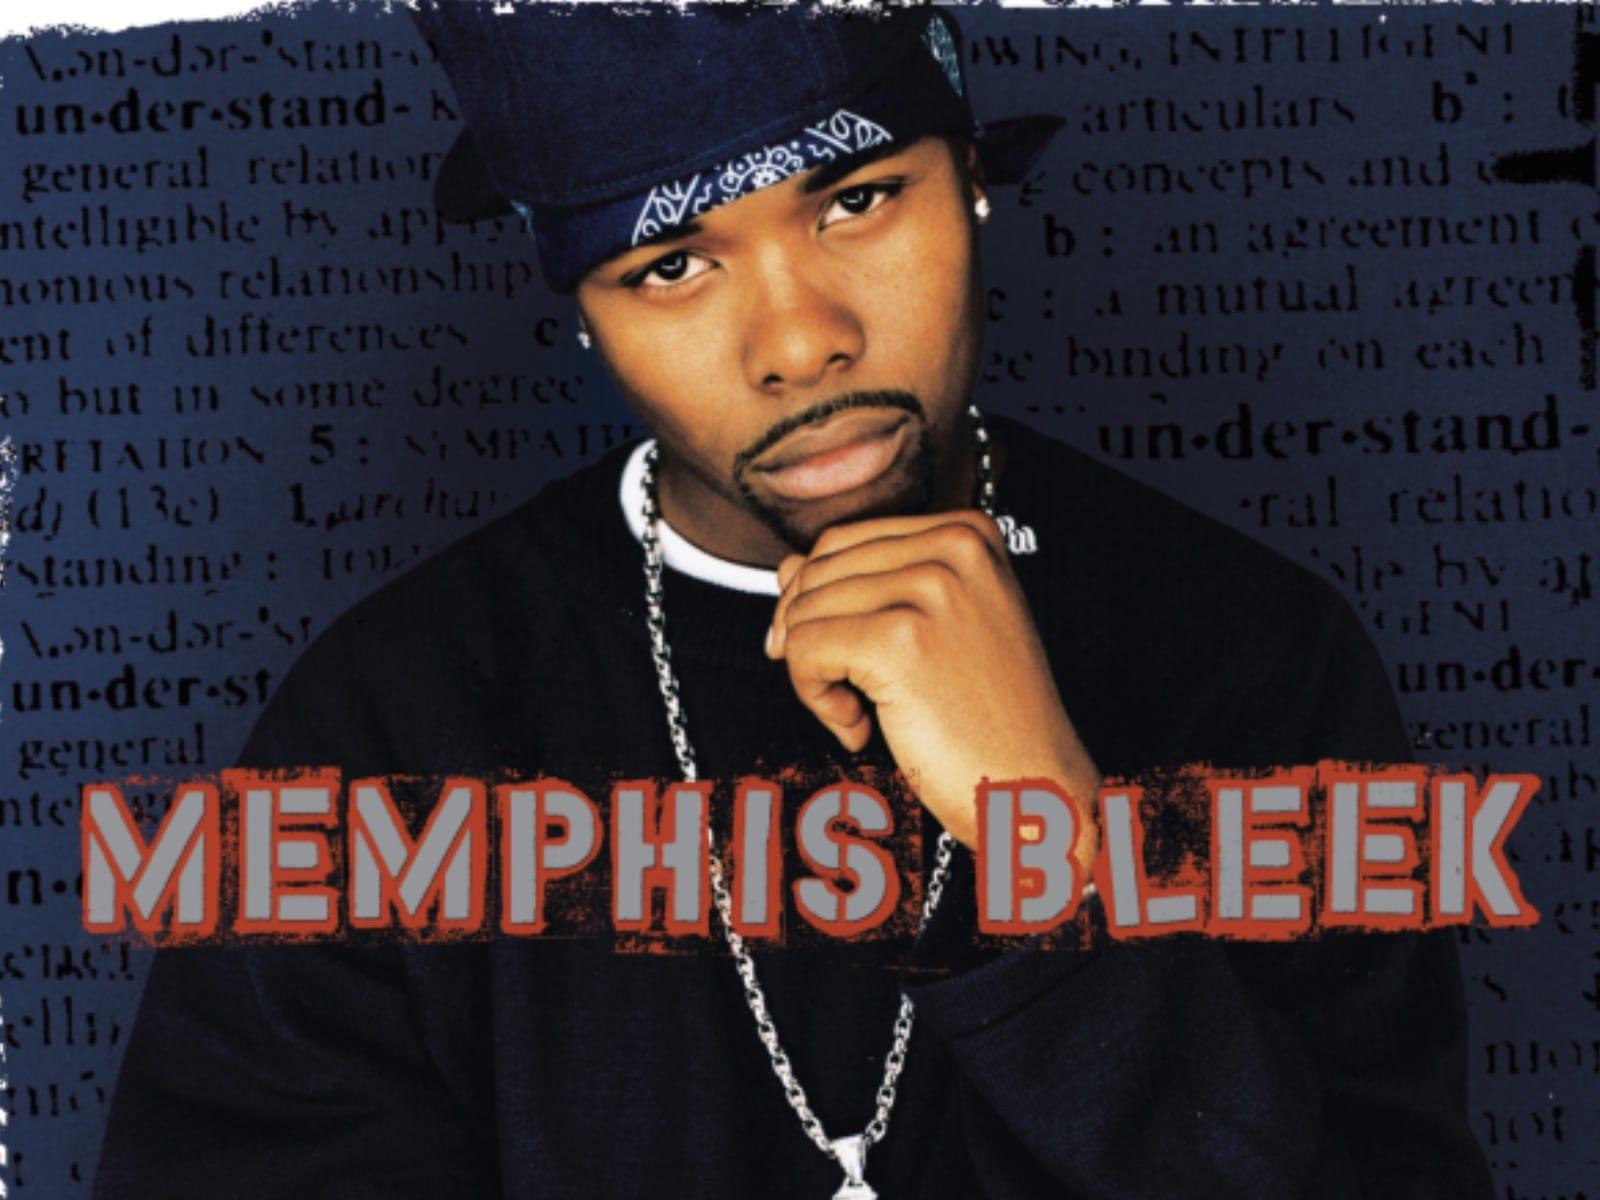 Memphis Bleek 12-6-19 The Understanding